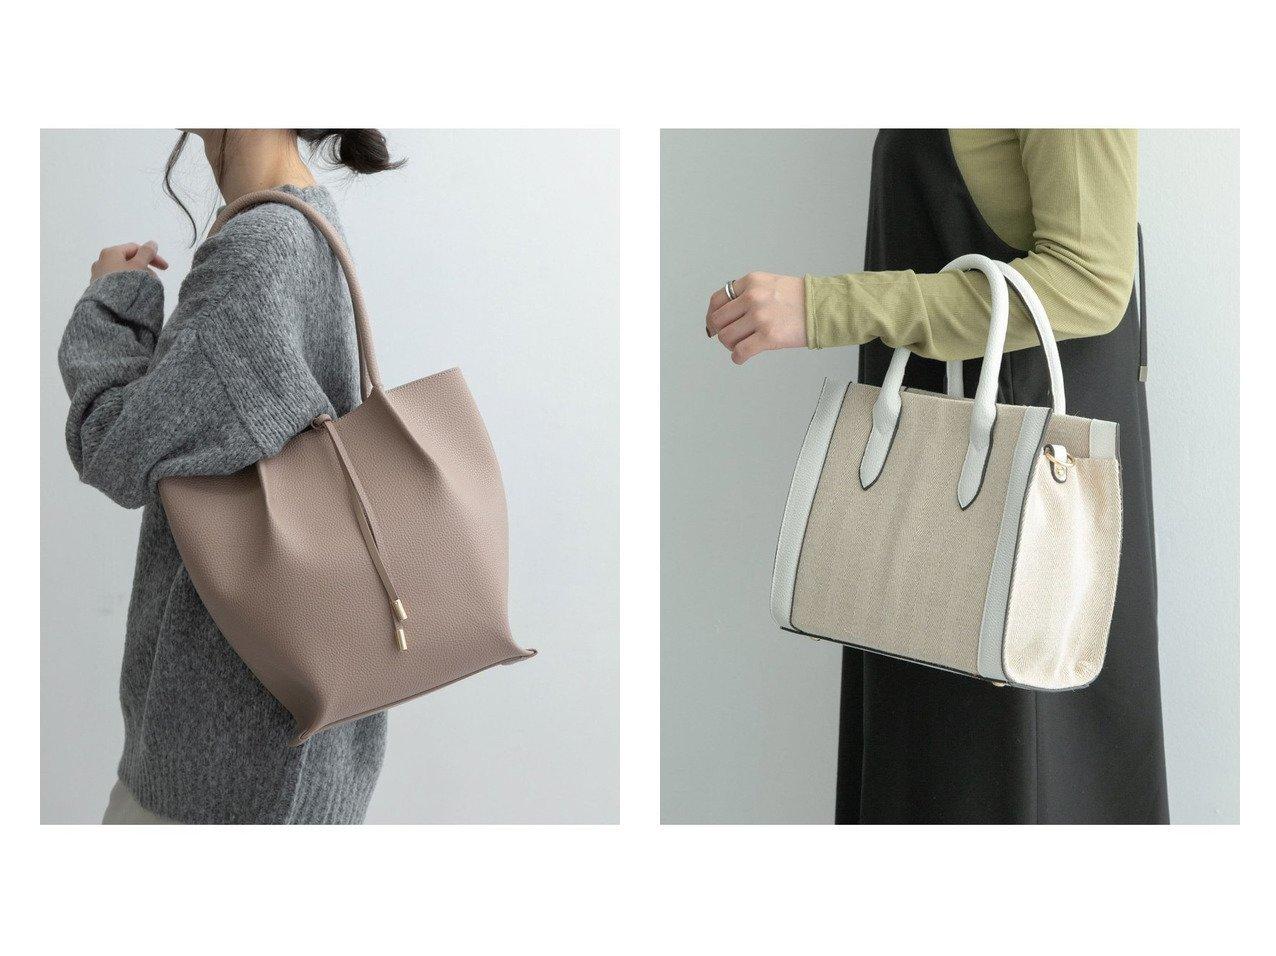 【RODE SKO/ロデスコ】のADONCIA ストリング付トートバッグ&JANNA キャンバス切替トートバッグ バッグ・鞄のおすすめ!人気、トレンド・レディースファッションの通販  おすすめで人気の流行・トレンド、ファッションの通販商品 メンズファッション・キッズファッション・インテリア・家具・レディースファッション・服の通販 founy(ファニー) https://founy.com/ ファッション Fashion レディースファッション WOMEN バッグ Bag ショルダー シンプル ストリング マグネット キャンバス スカーフ チャーム フェイクレザー ボックス ポケット ポーチ 切替 |ID:crp329100000009909